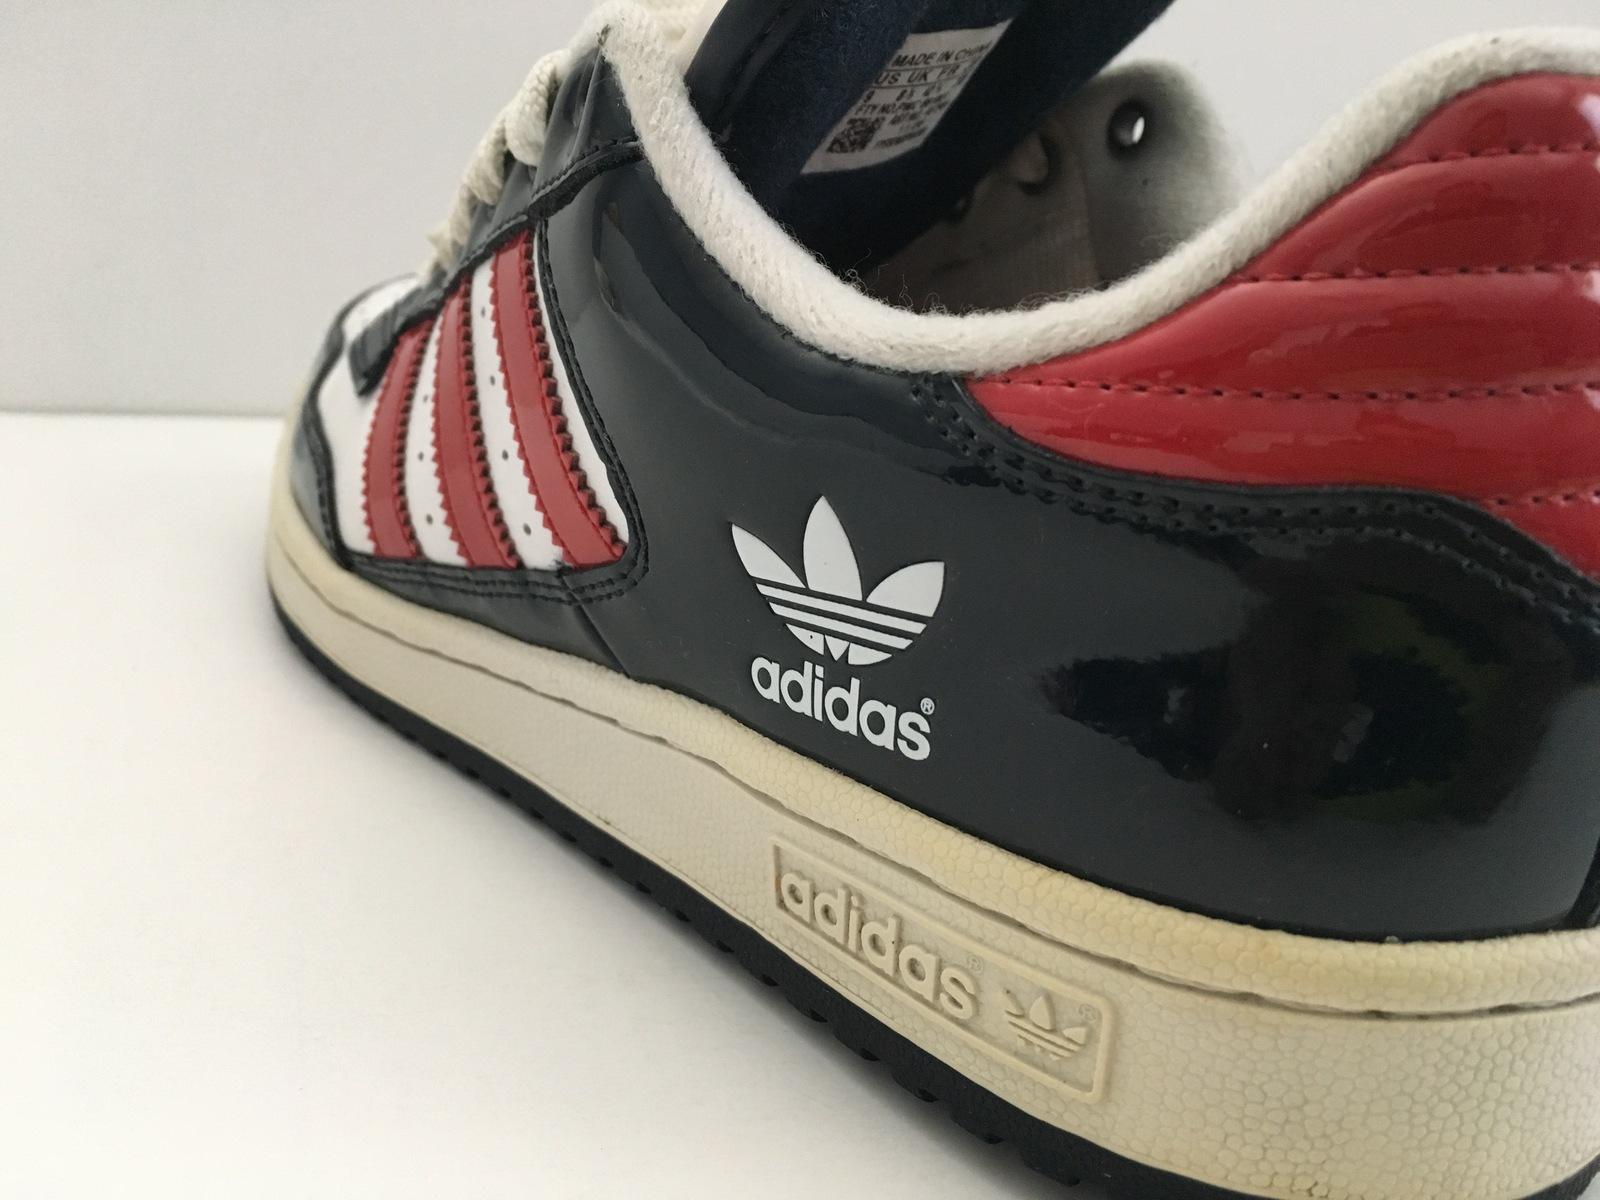 sale retailer bb2e0 f88d6 Adidas Centennial Lo 467969 Originals Men Size 9